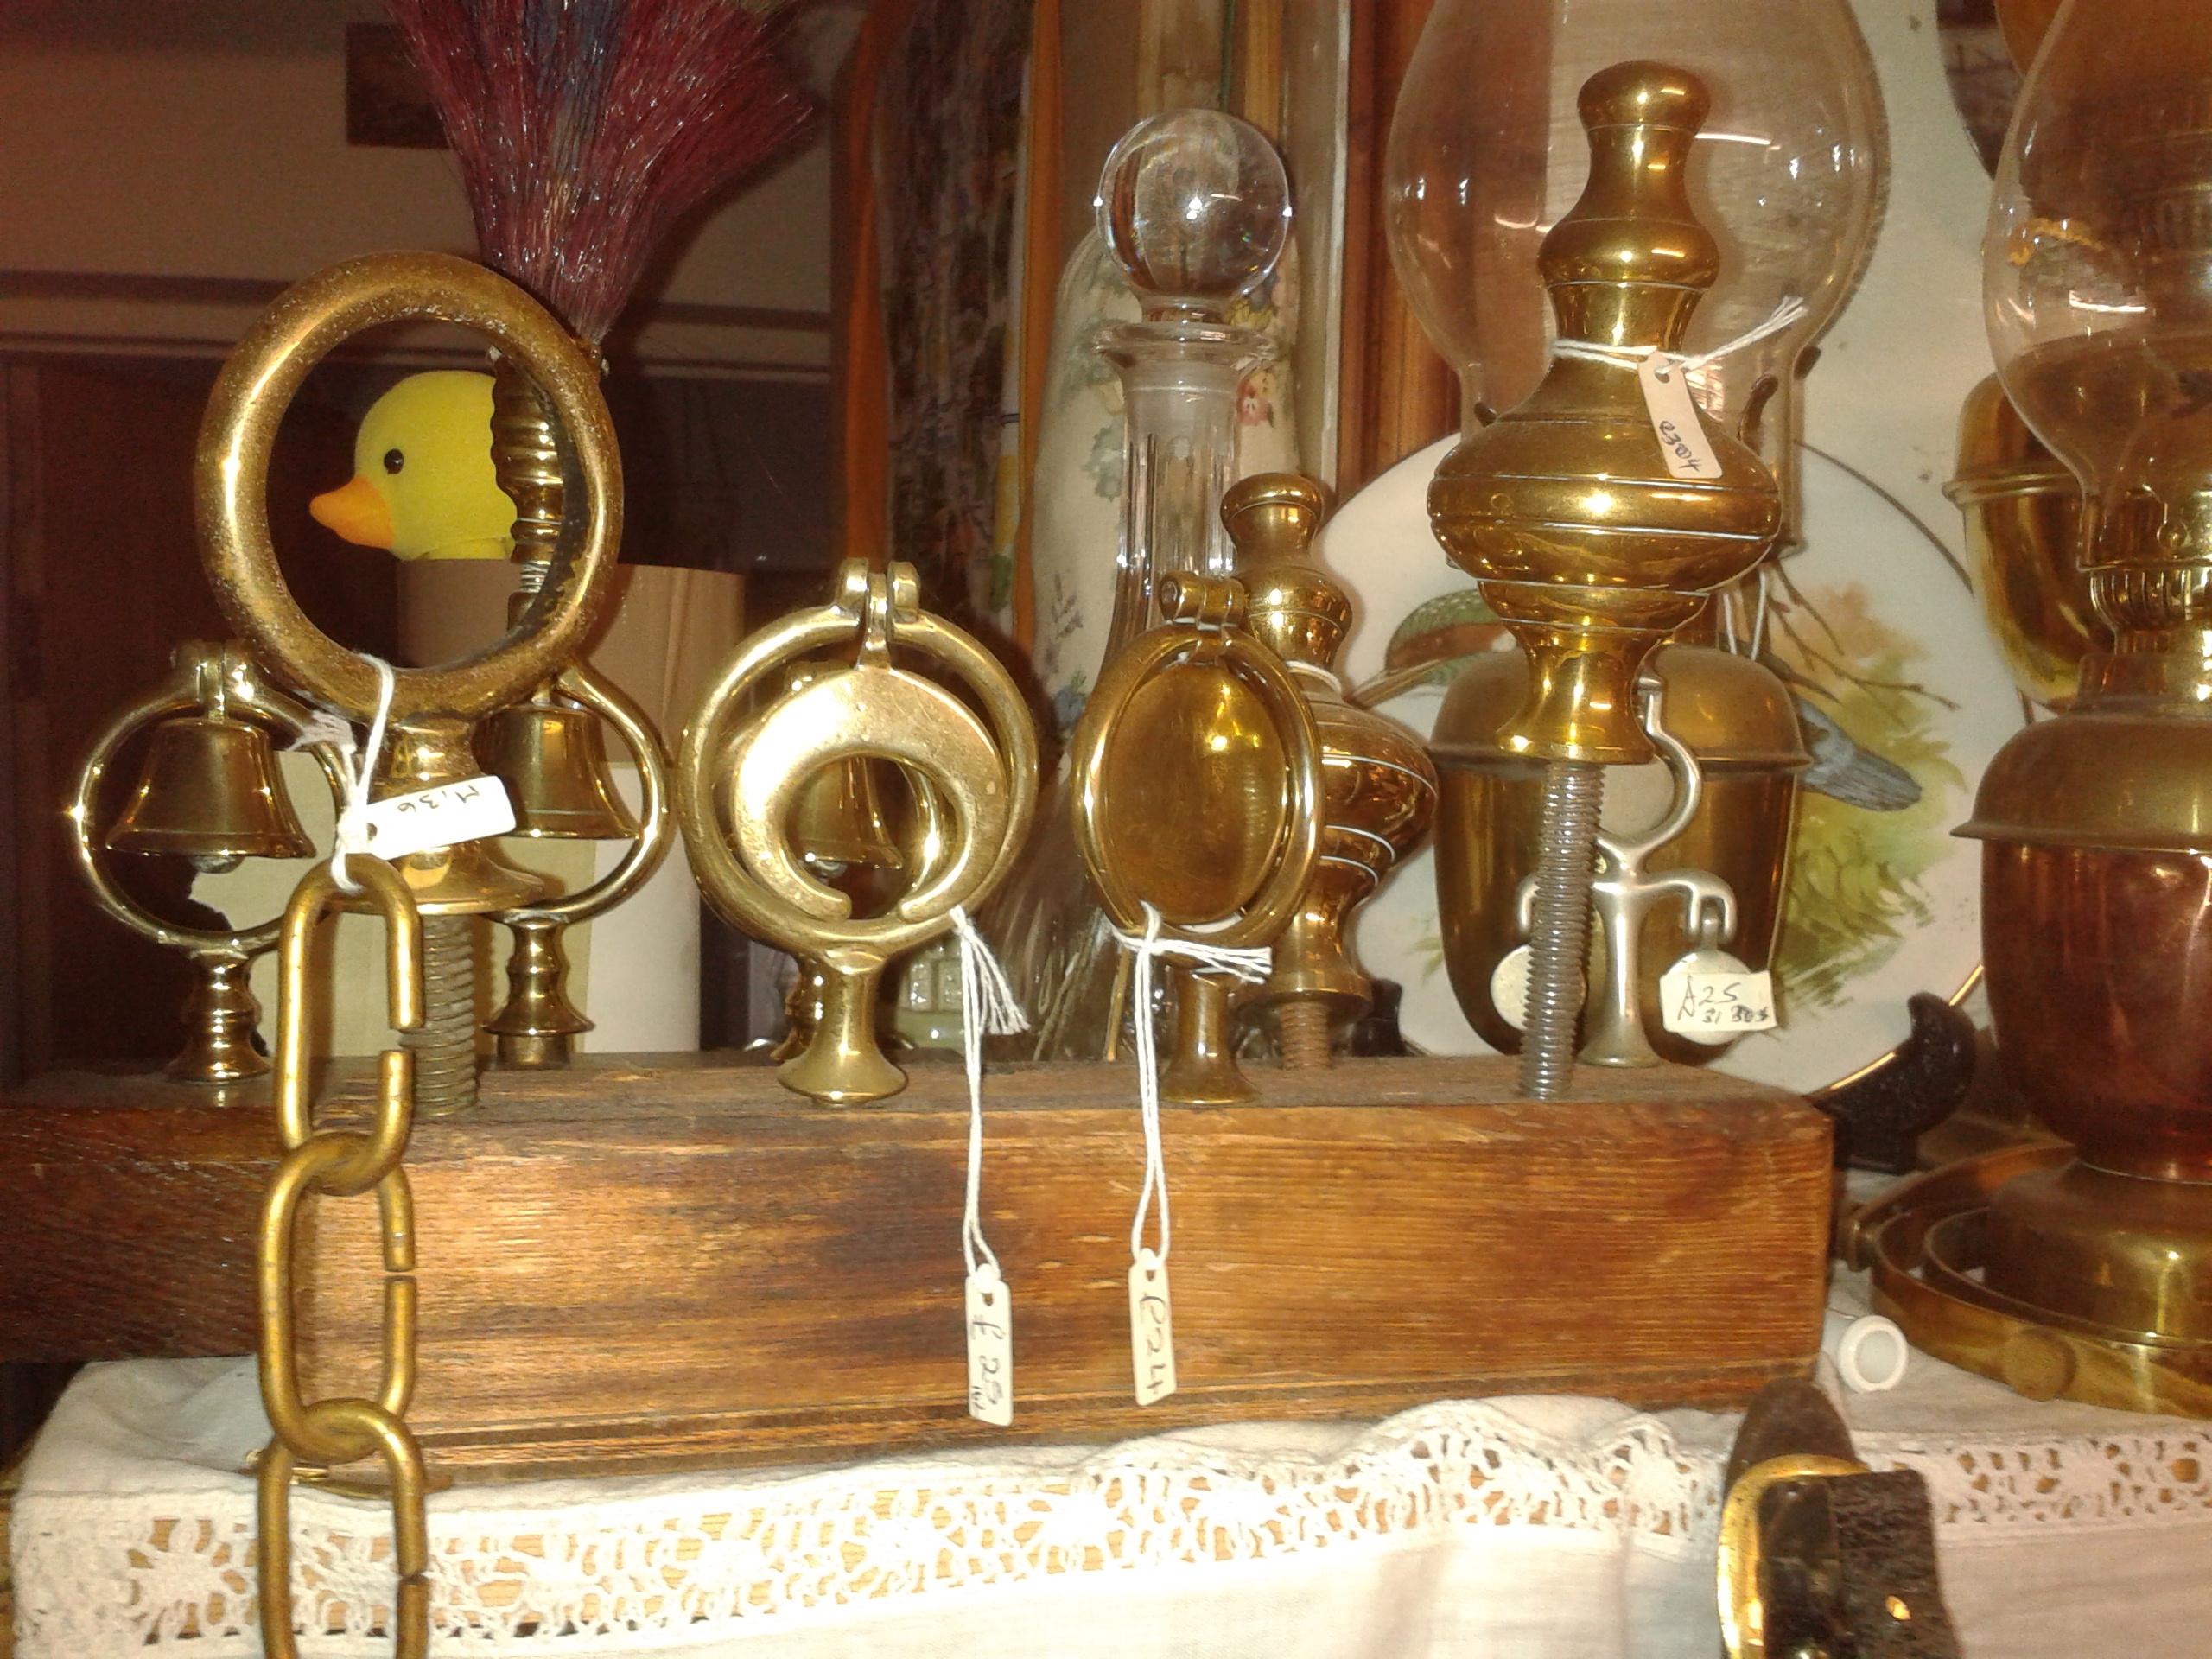 Brass things!